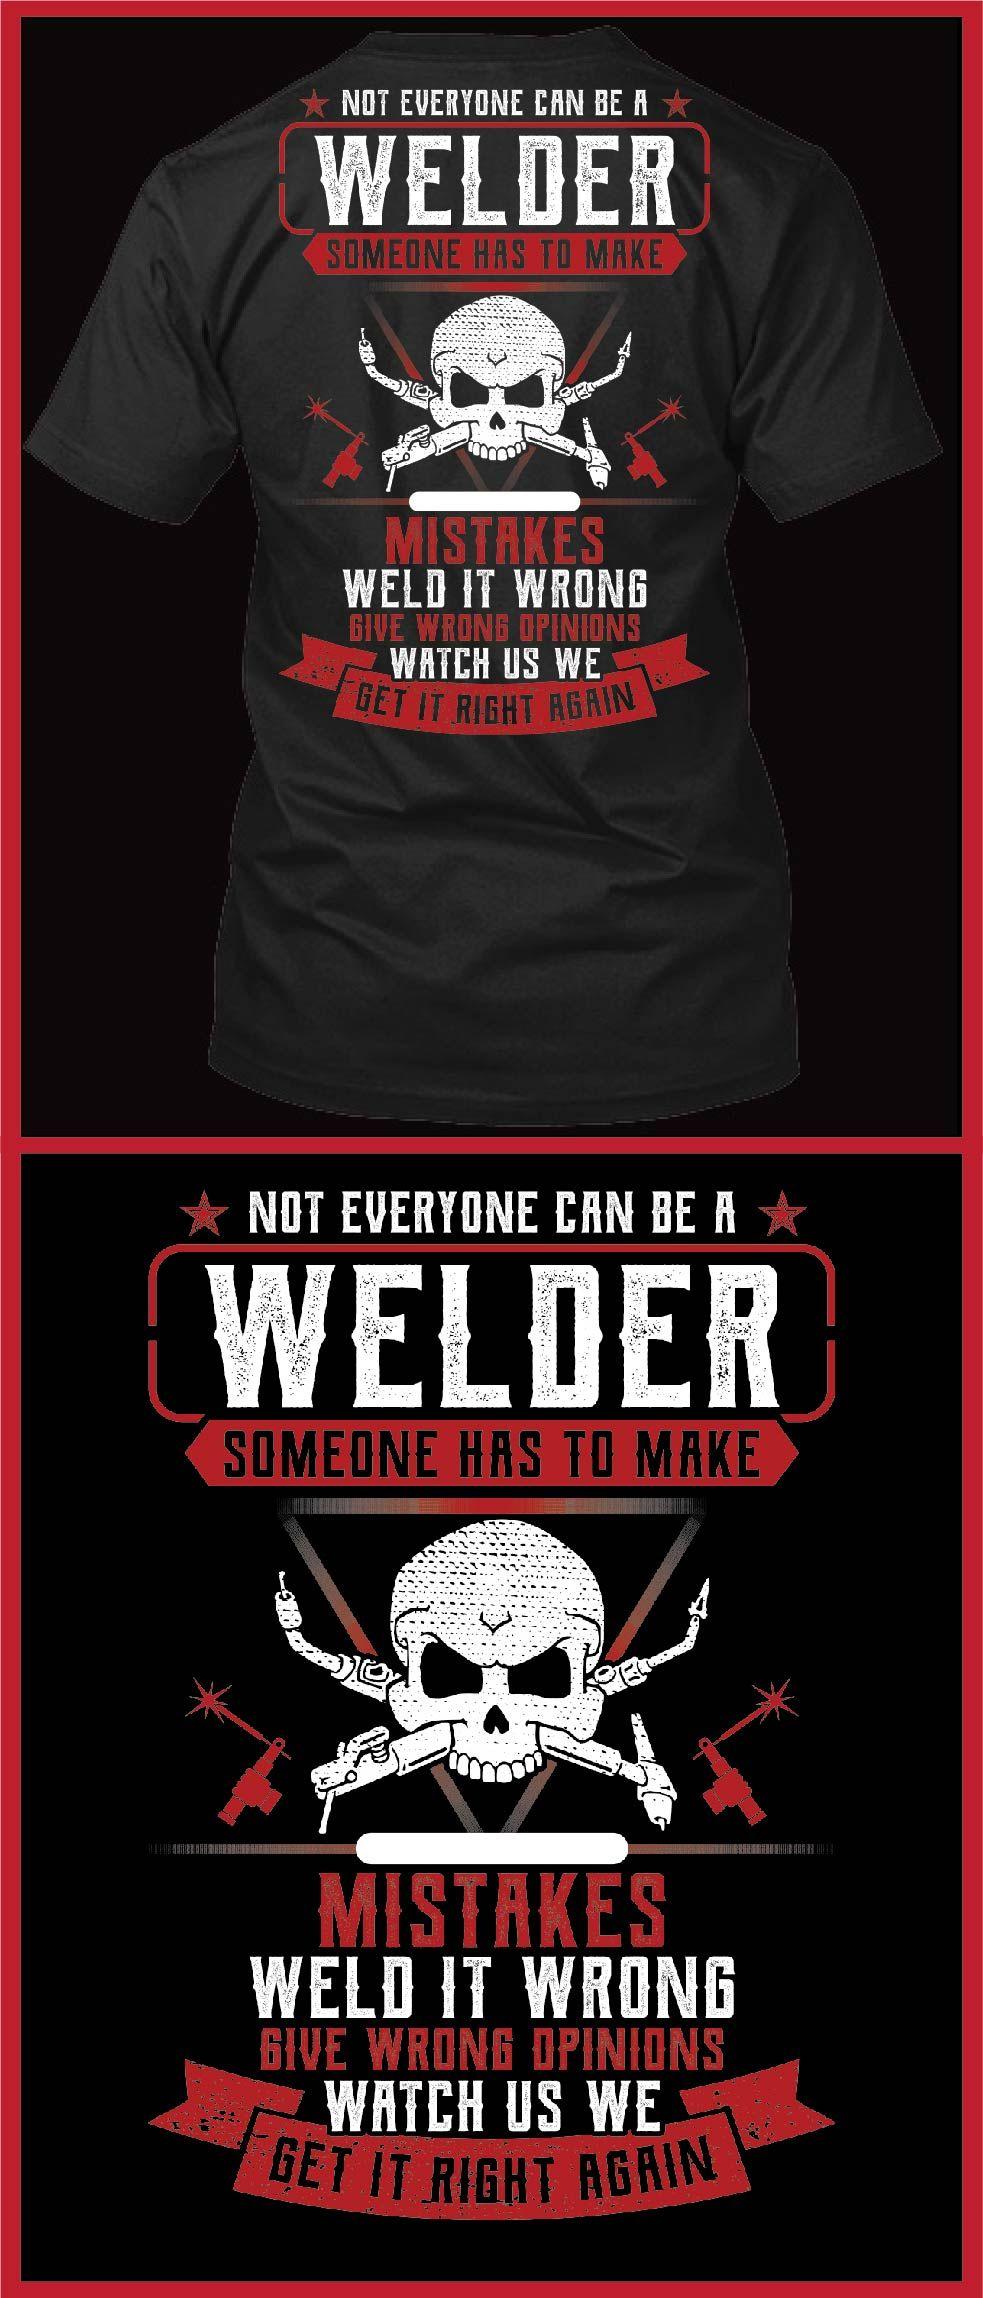 a430842f Welder memes and welder quotes.Welder Gifts.Welder t shirts funny.welder  memes.welder quotes.welders wife.welder's wife.welder shirts.welder shirts  ...